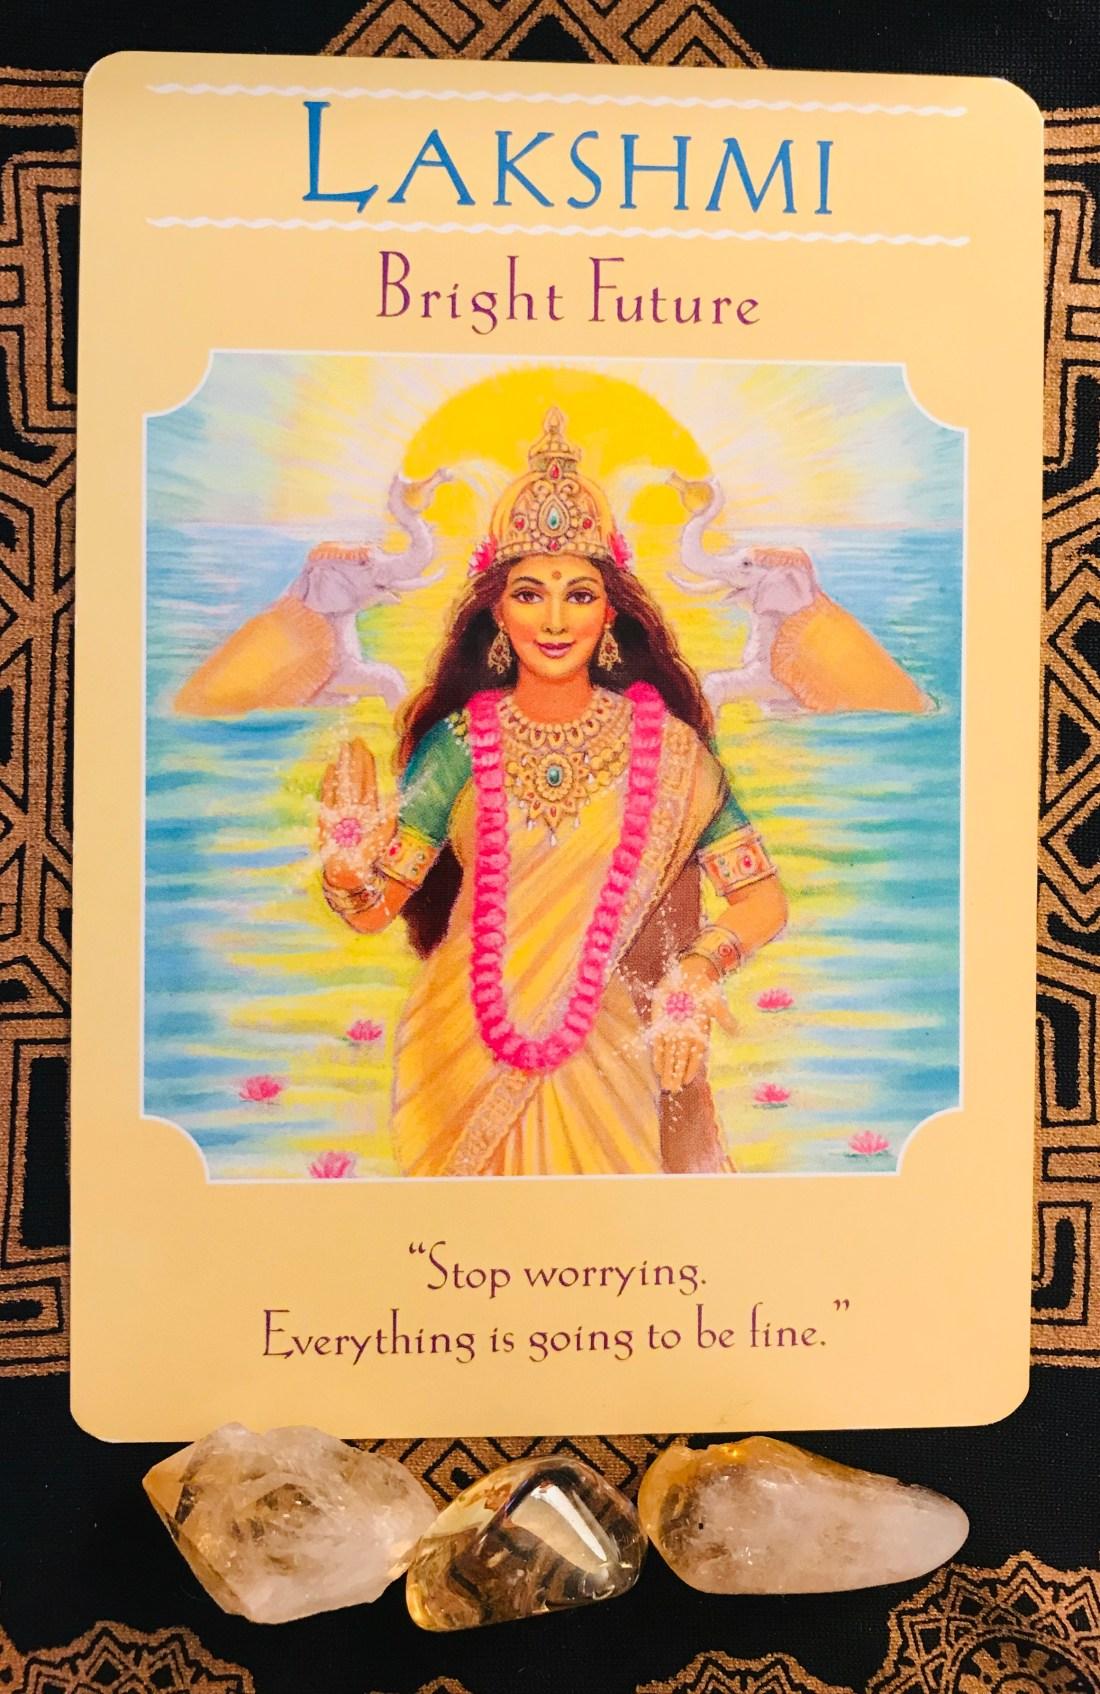 tarot card of the week is create abundance and Lakshmi, Hindi Goddess